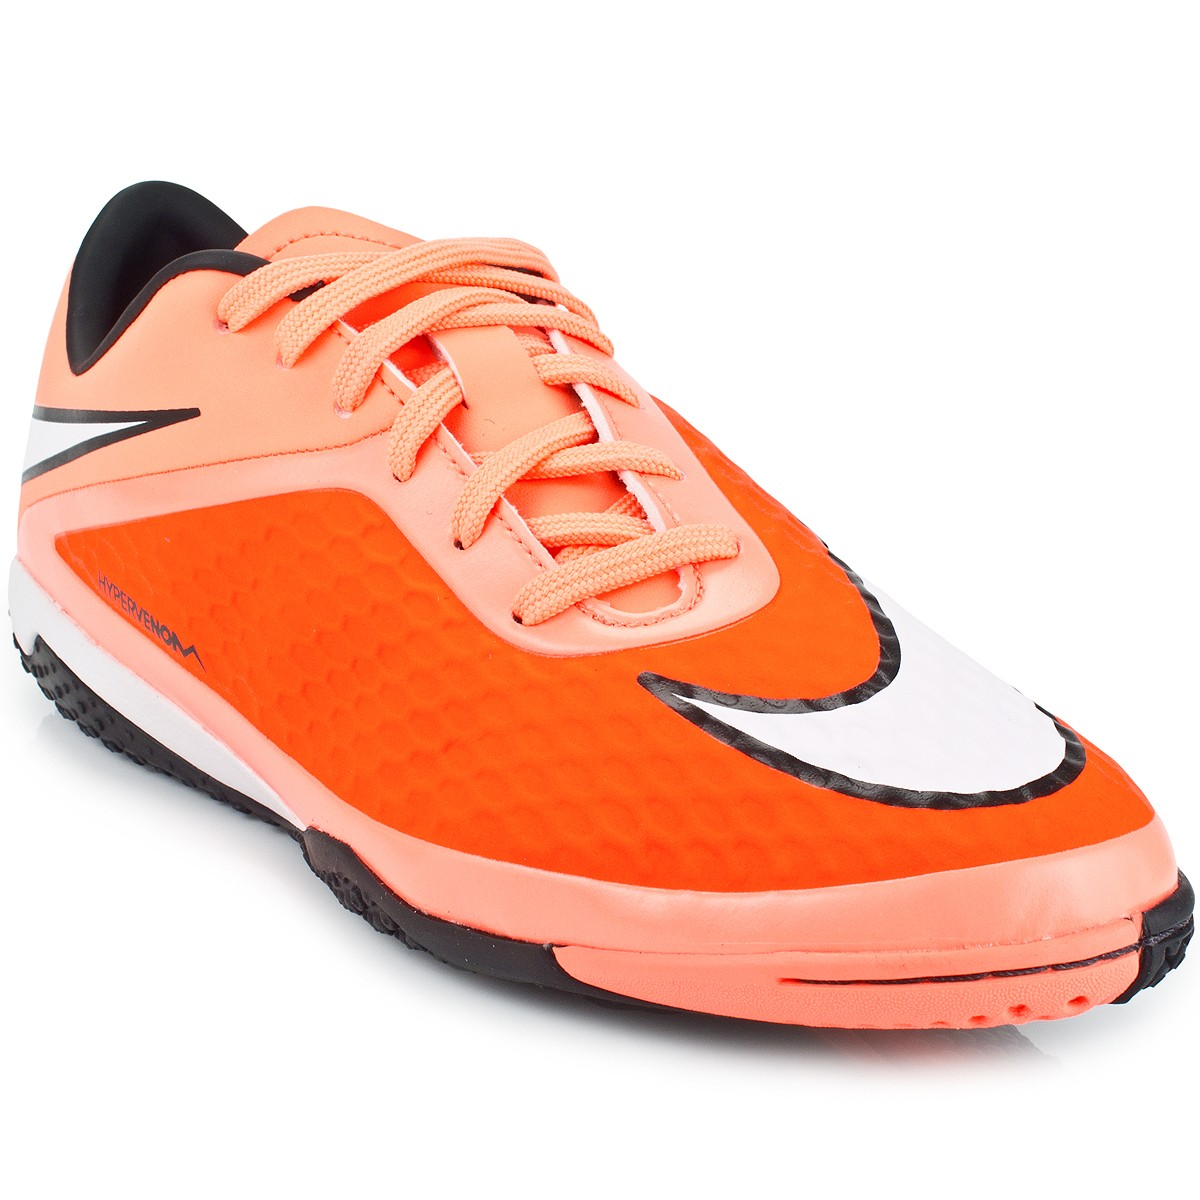 deb1b6d9bd Chuteira Nike Hypervenom Phelon IC 599849